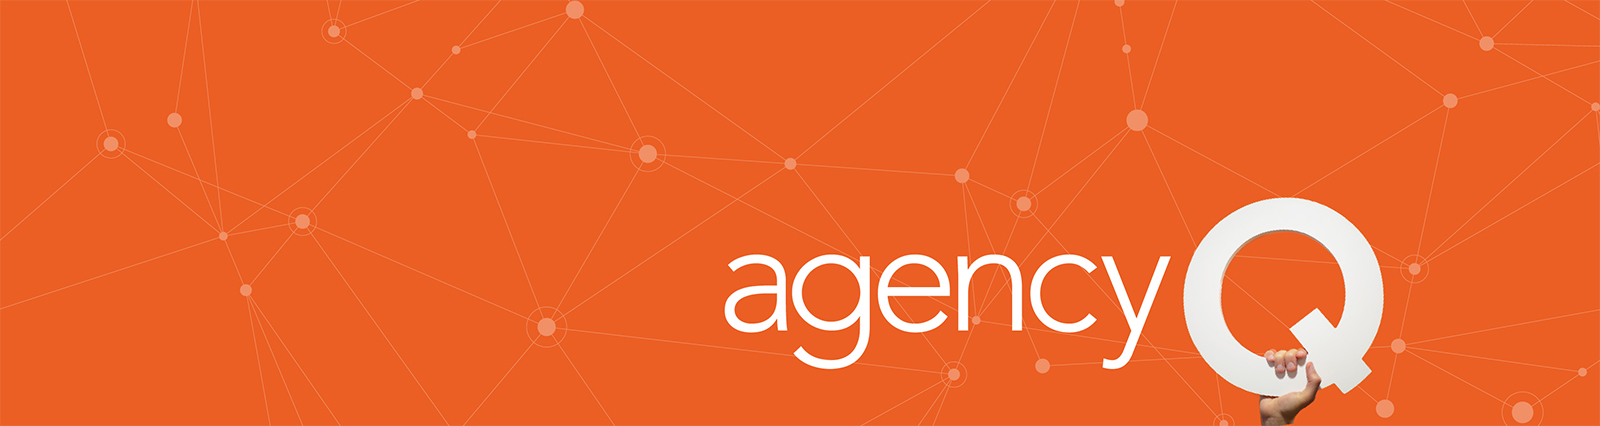 agencyQ hero banner